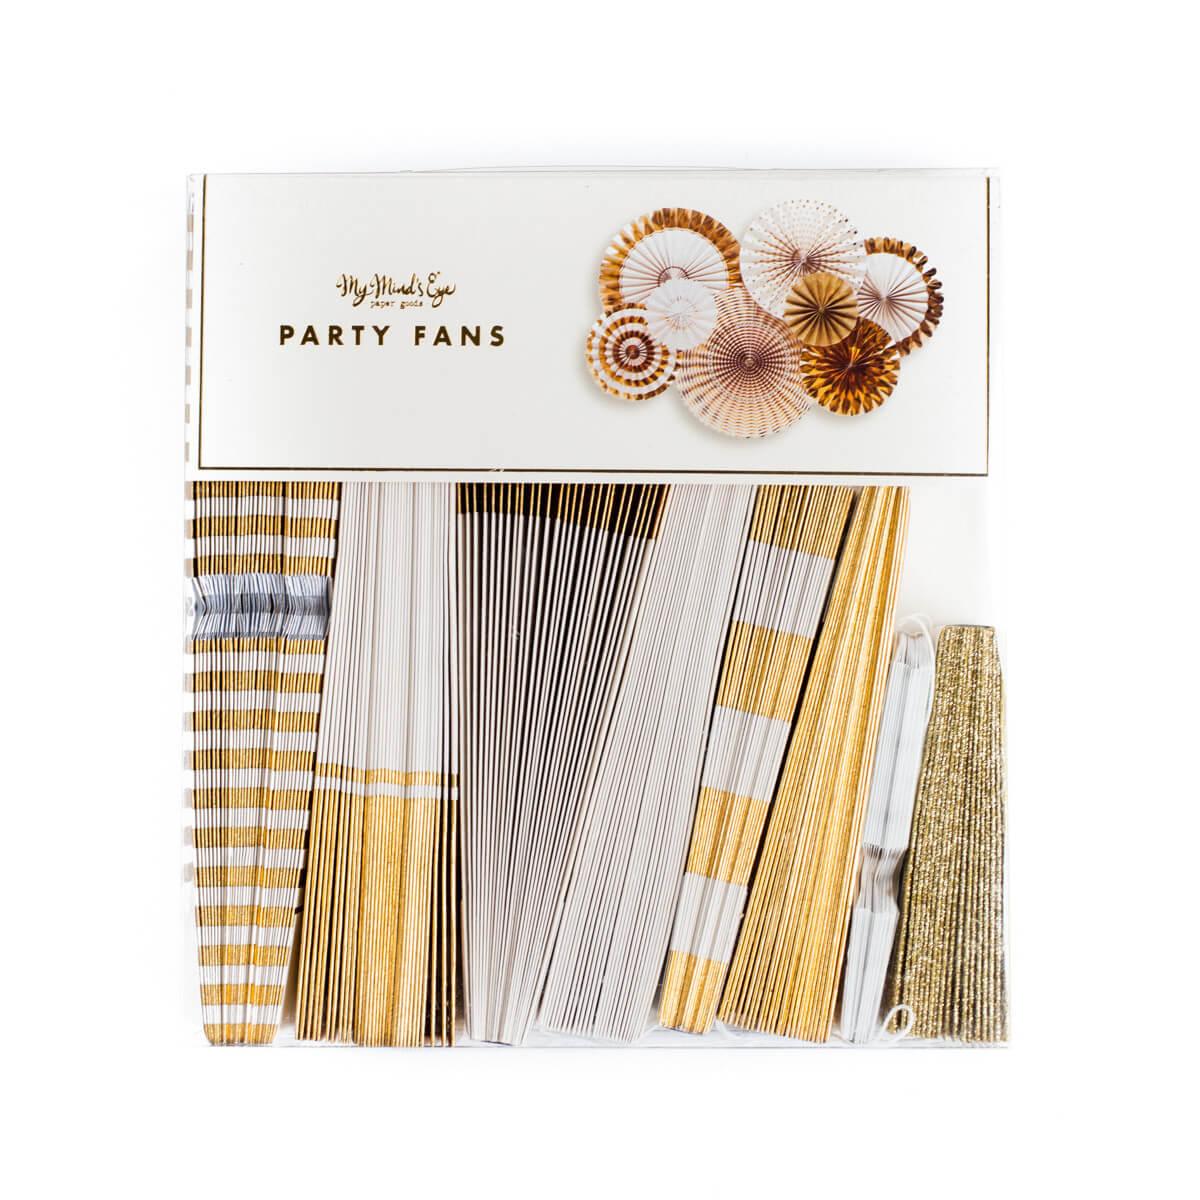 Fancy Party Fans Rosette Pinwheels Gold & White, Wedding Decorations, 8 Fans, MME